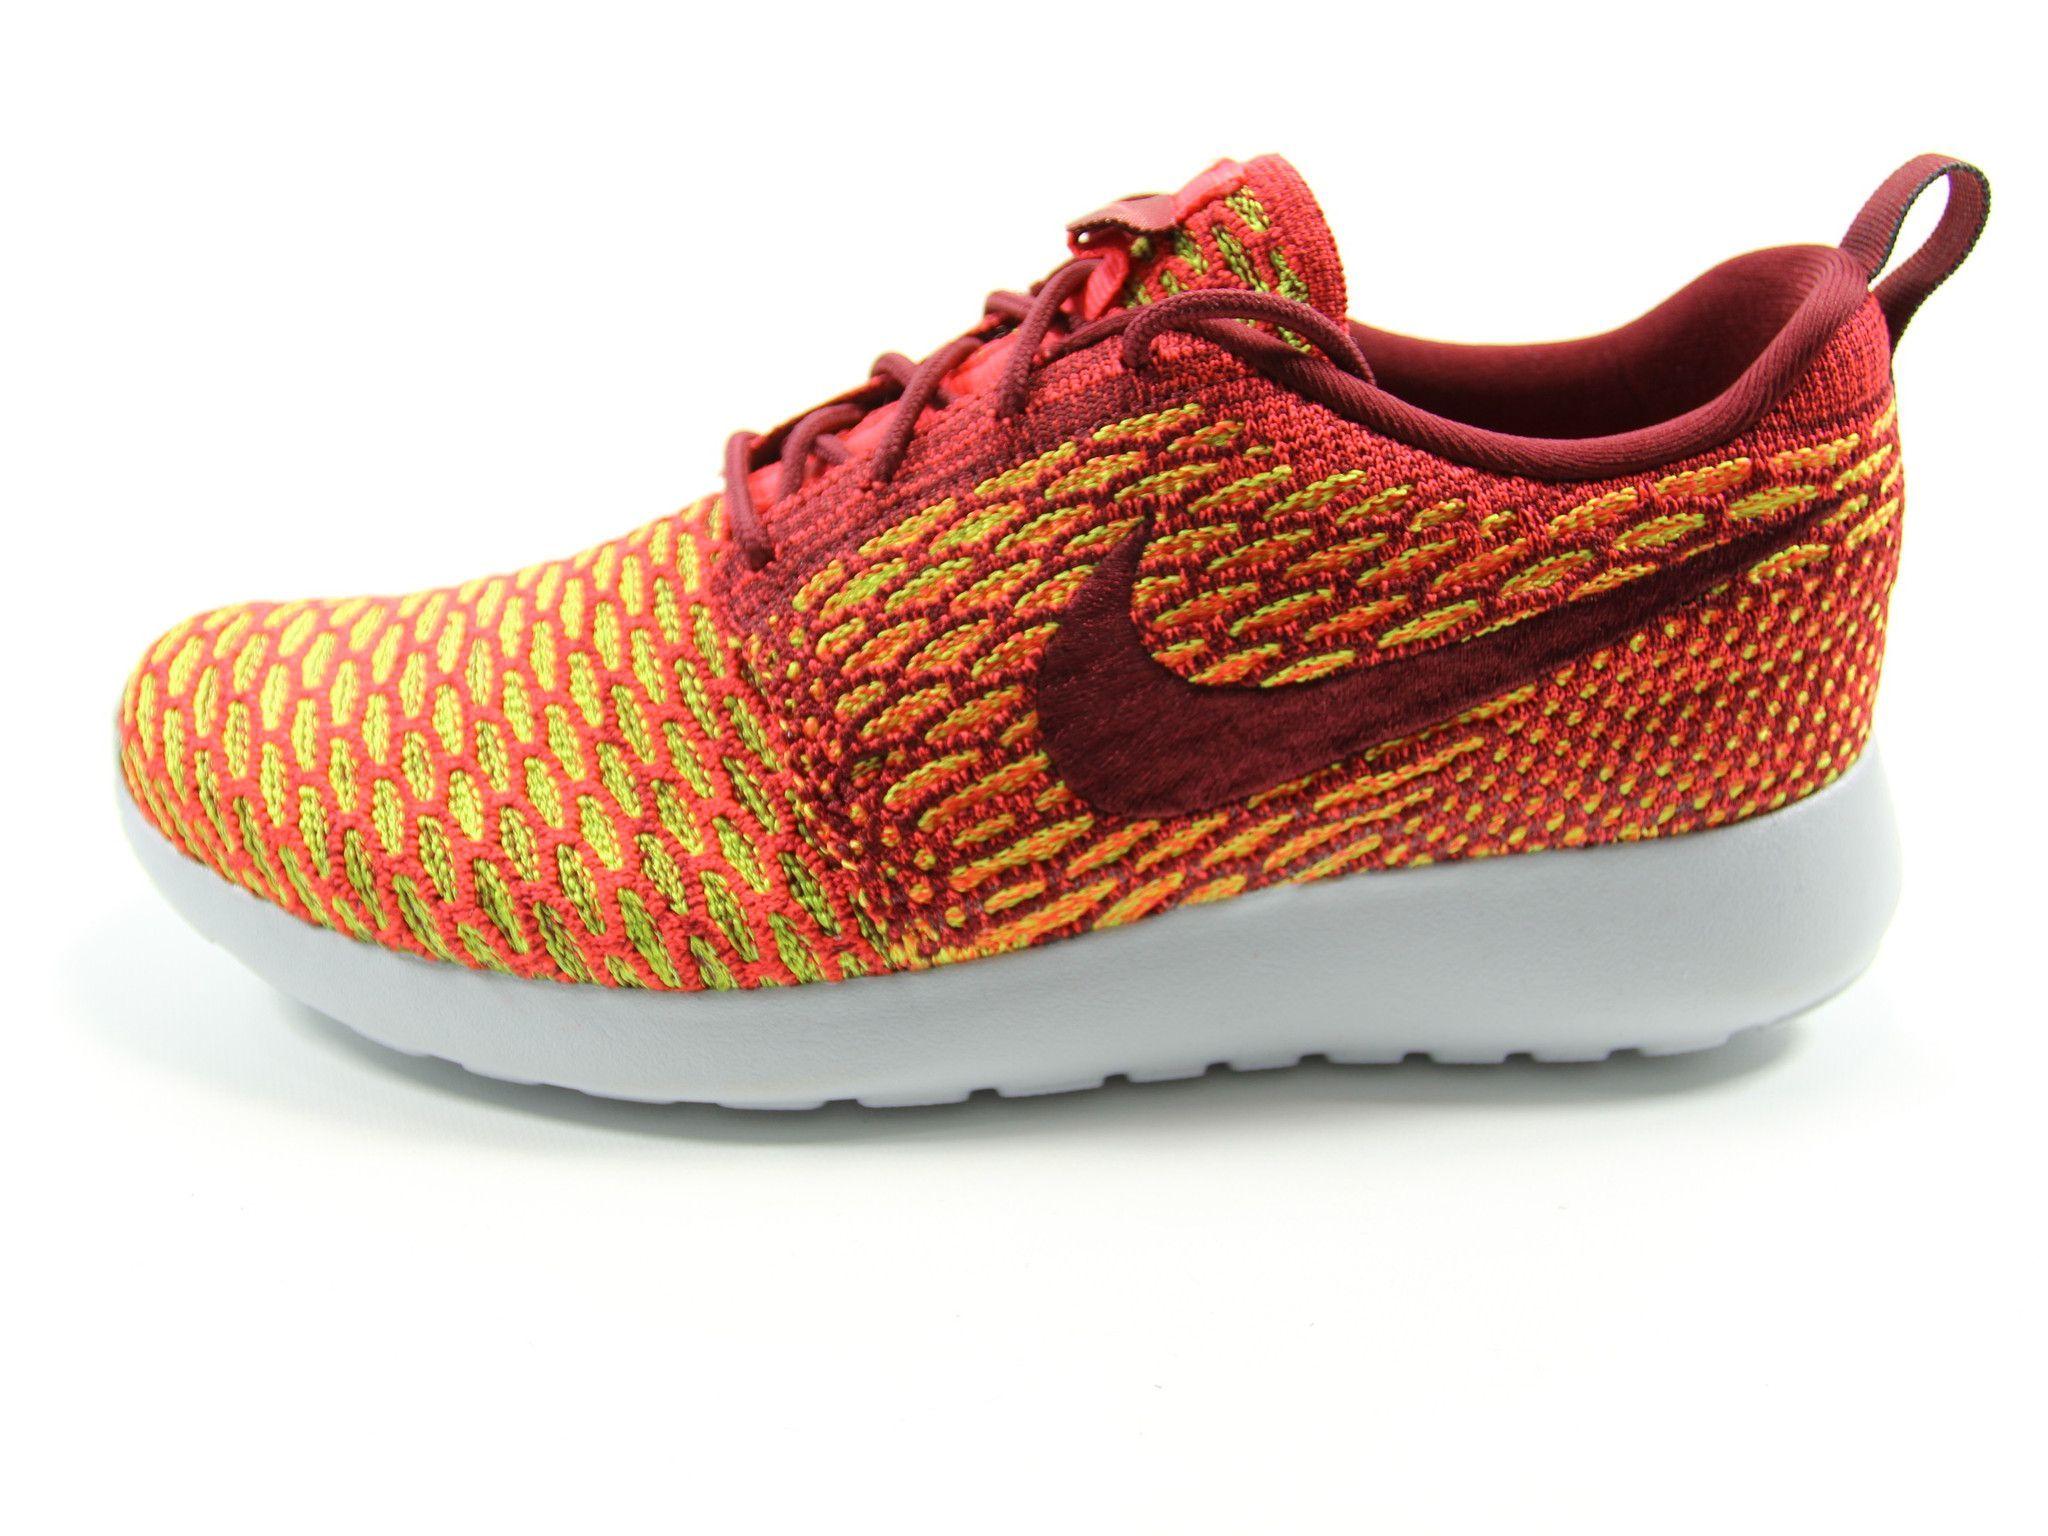 nike womens shoes roshe flyknit one scarlett\/red